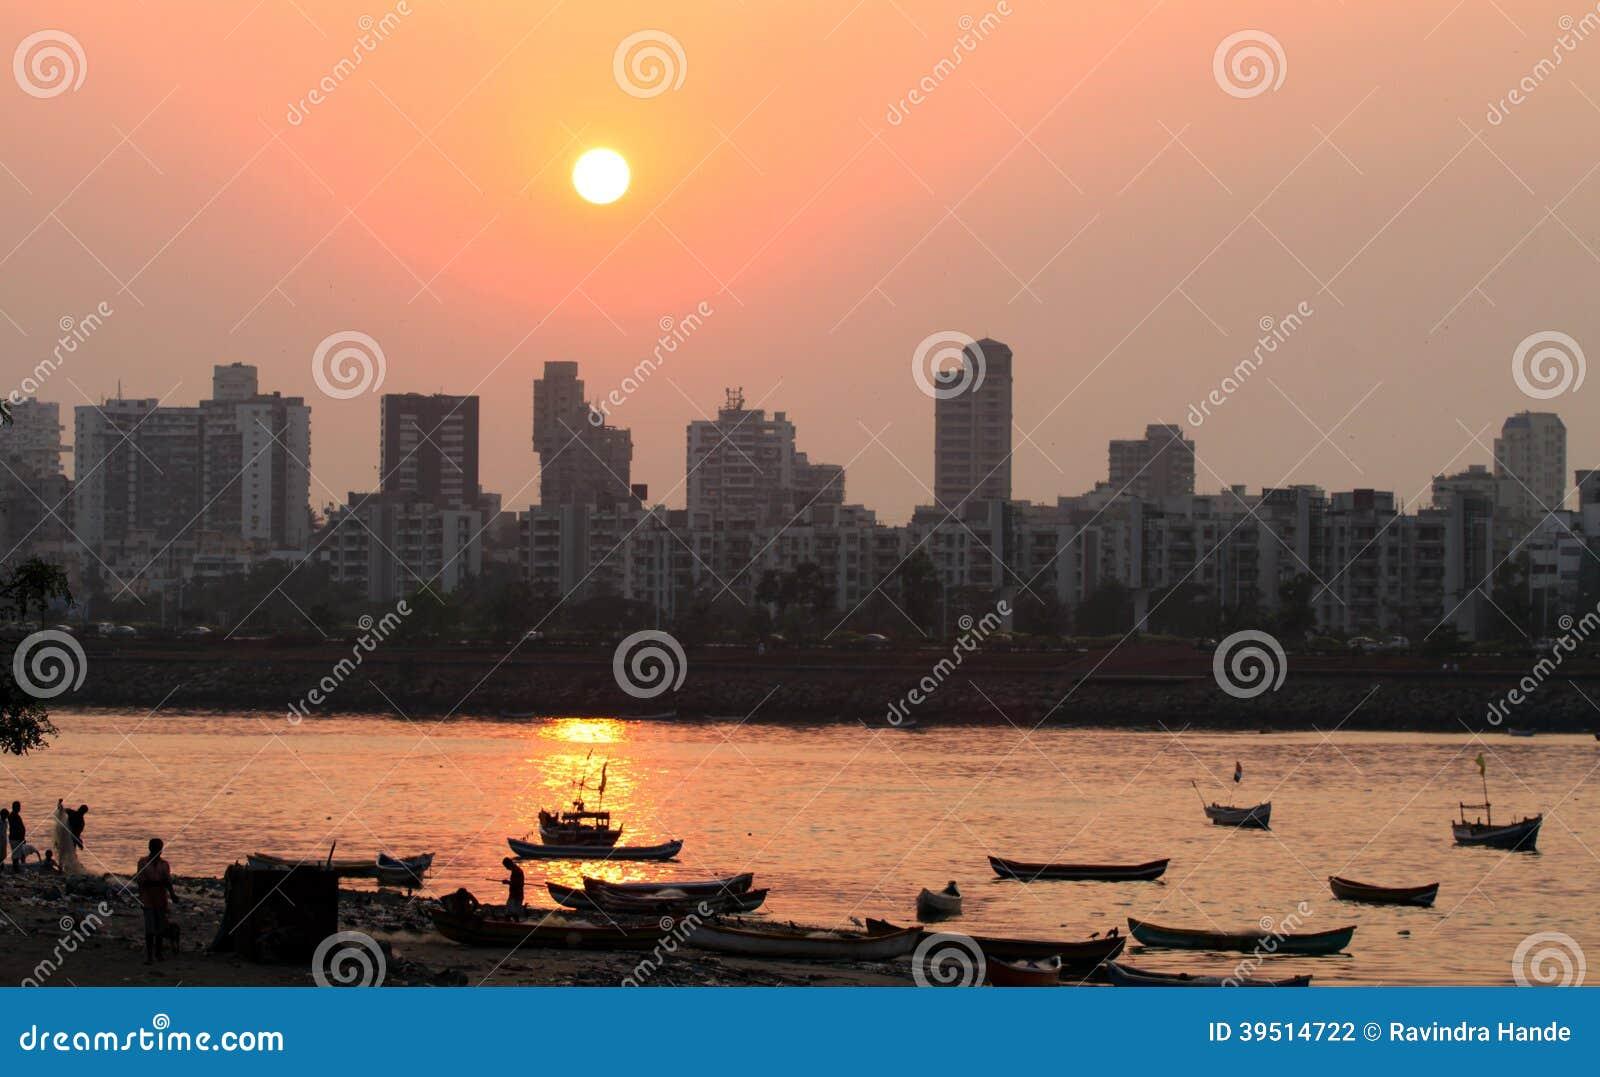 Sunset at Bandra in Mumbai